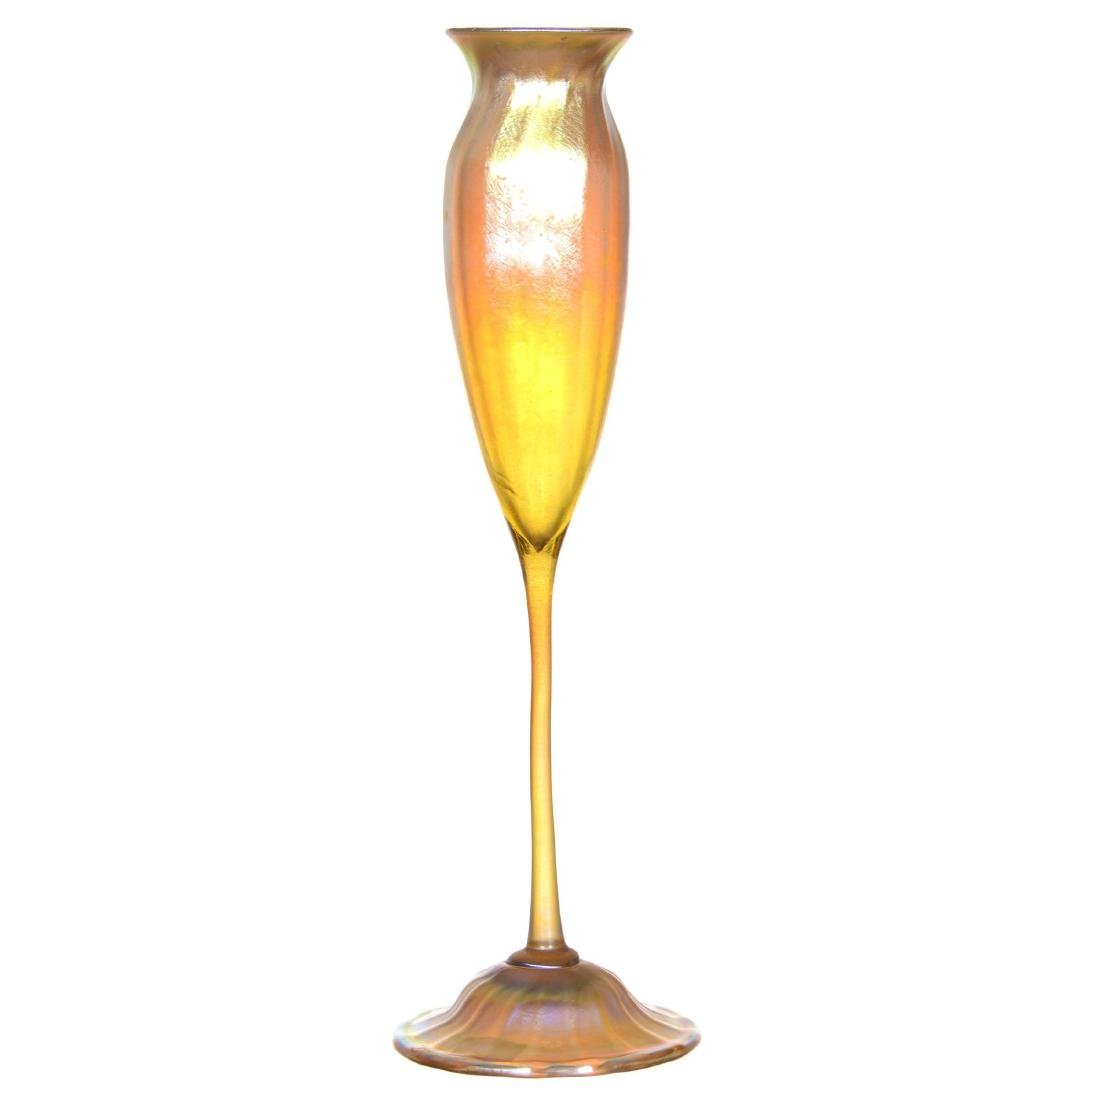 Tiffany Art Glass Flower Form